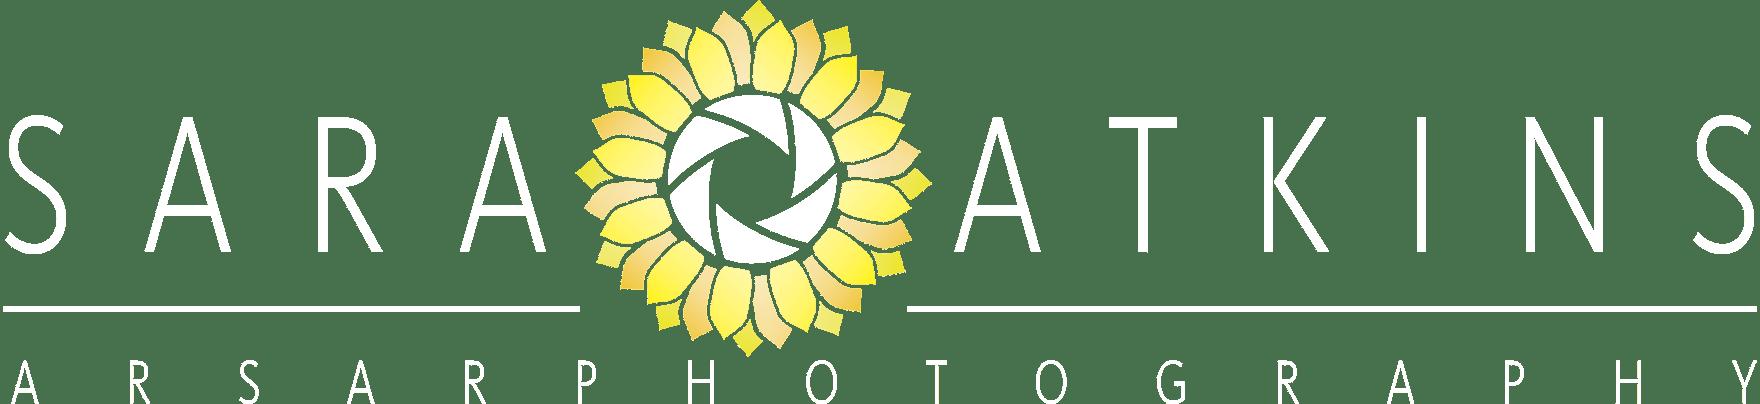 75%_sara-logo-horiz-whitetext